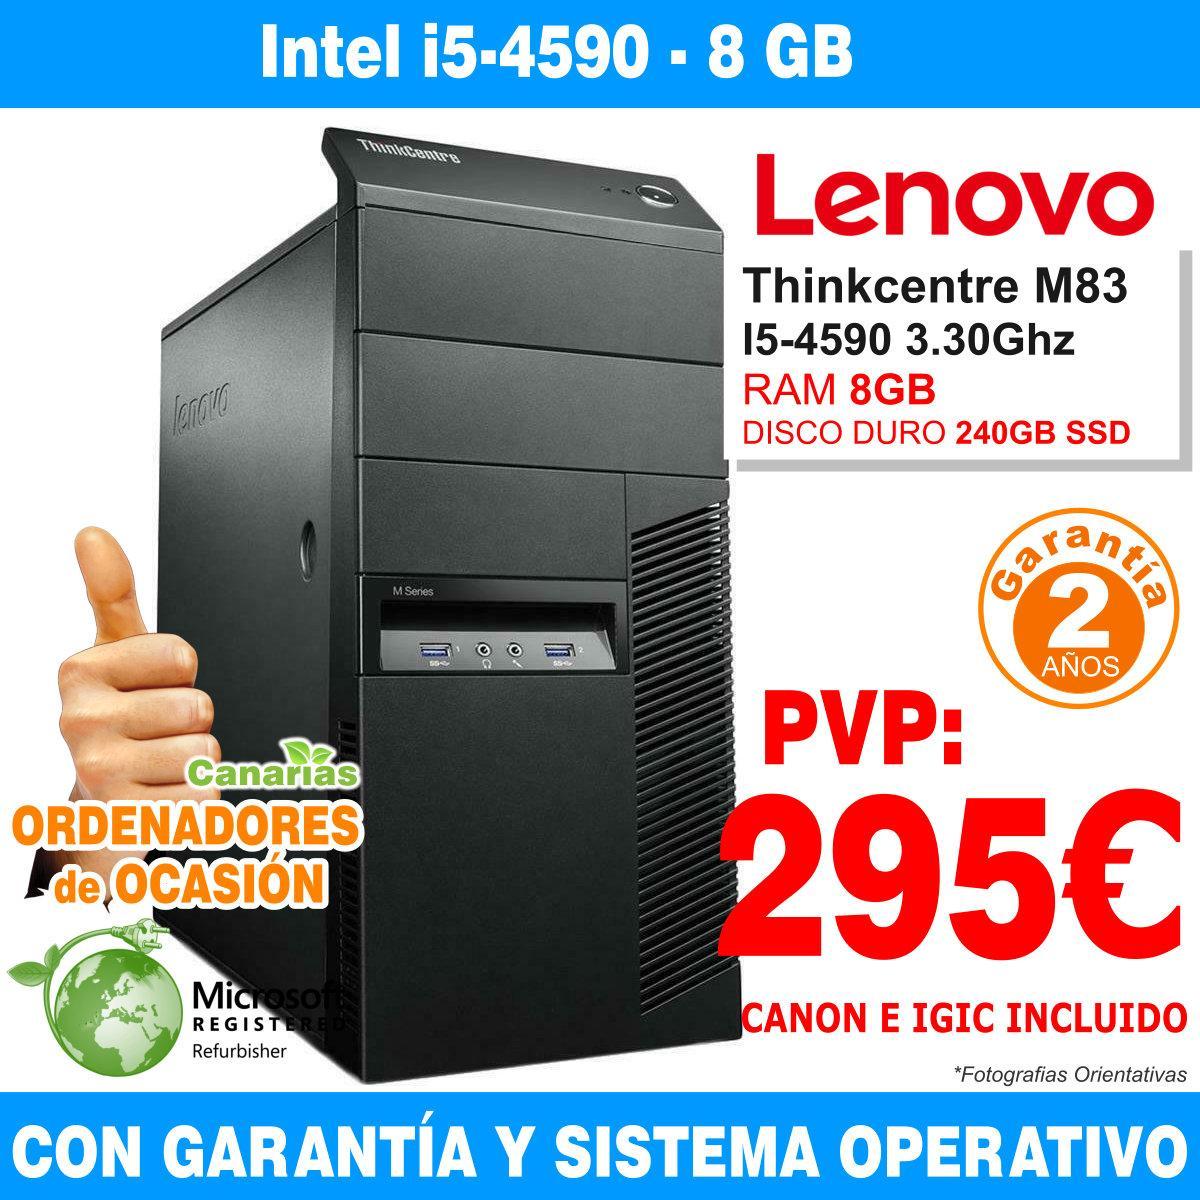 Intel Core I5-4590 3.30GHz - 8GB - 240GB SSD  - LENOVO THINKCENTRE M83 MT